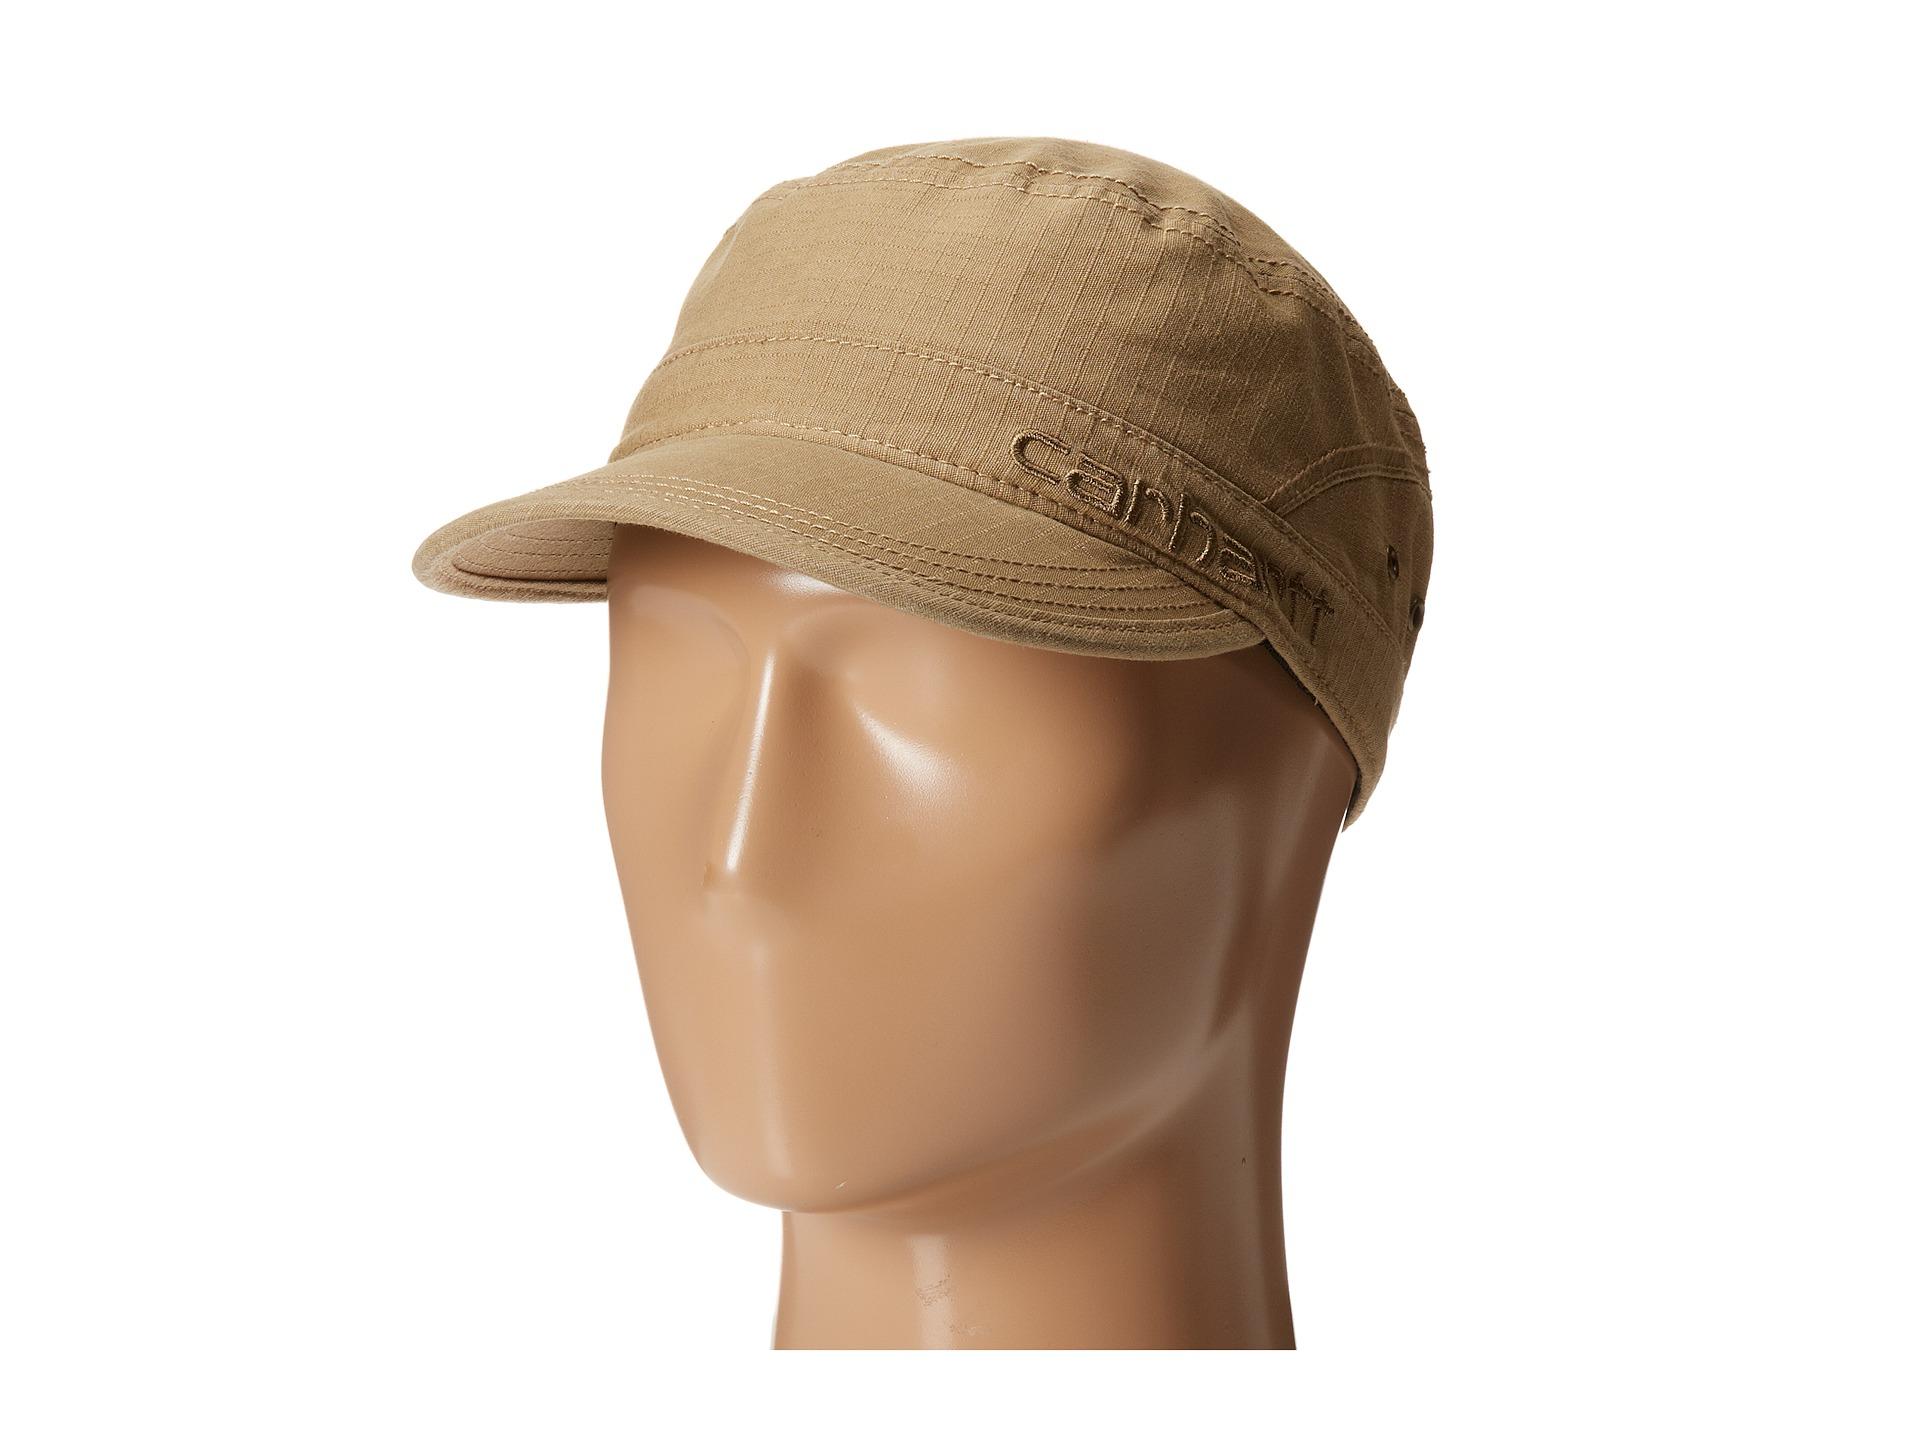 596cee8b3e2e2 Lyst - Carhartt Irvine Military Cap in Natural for Men